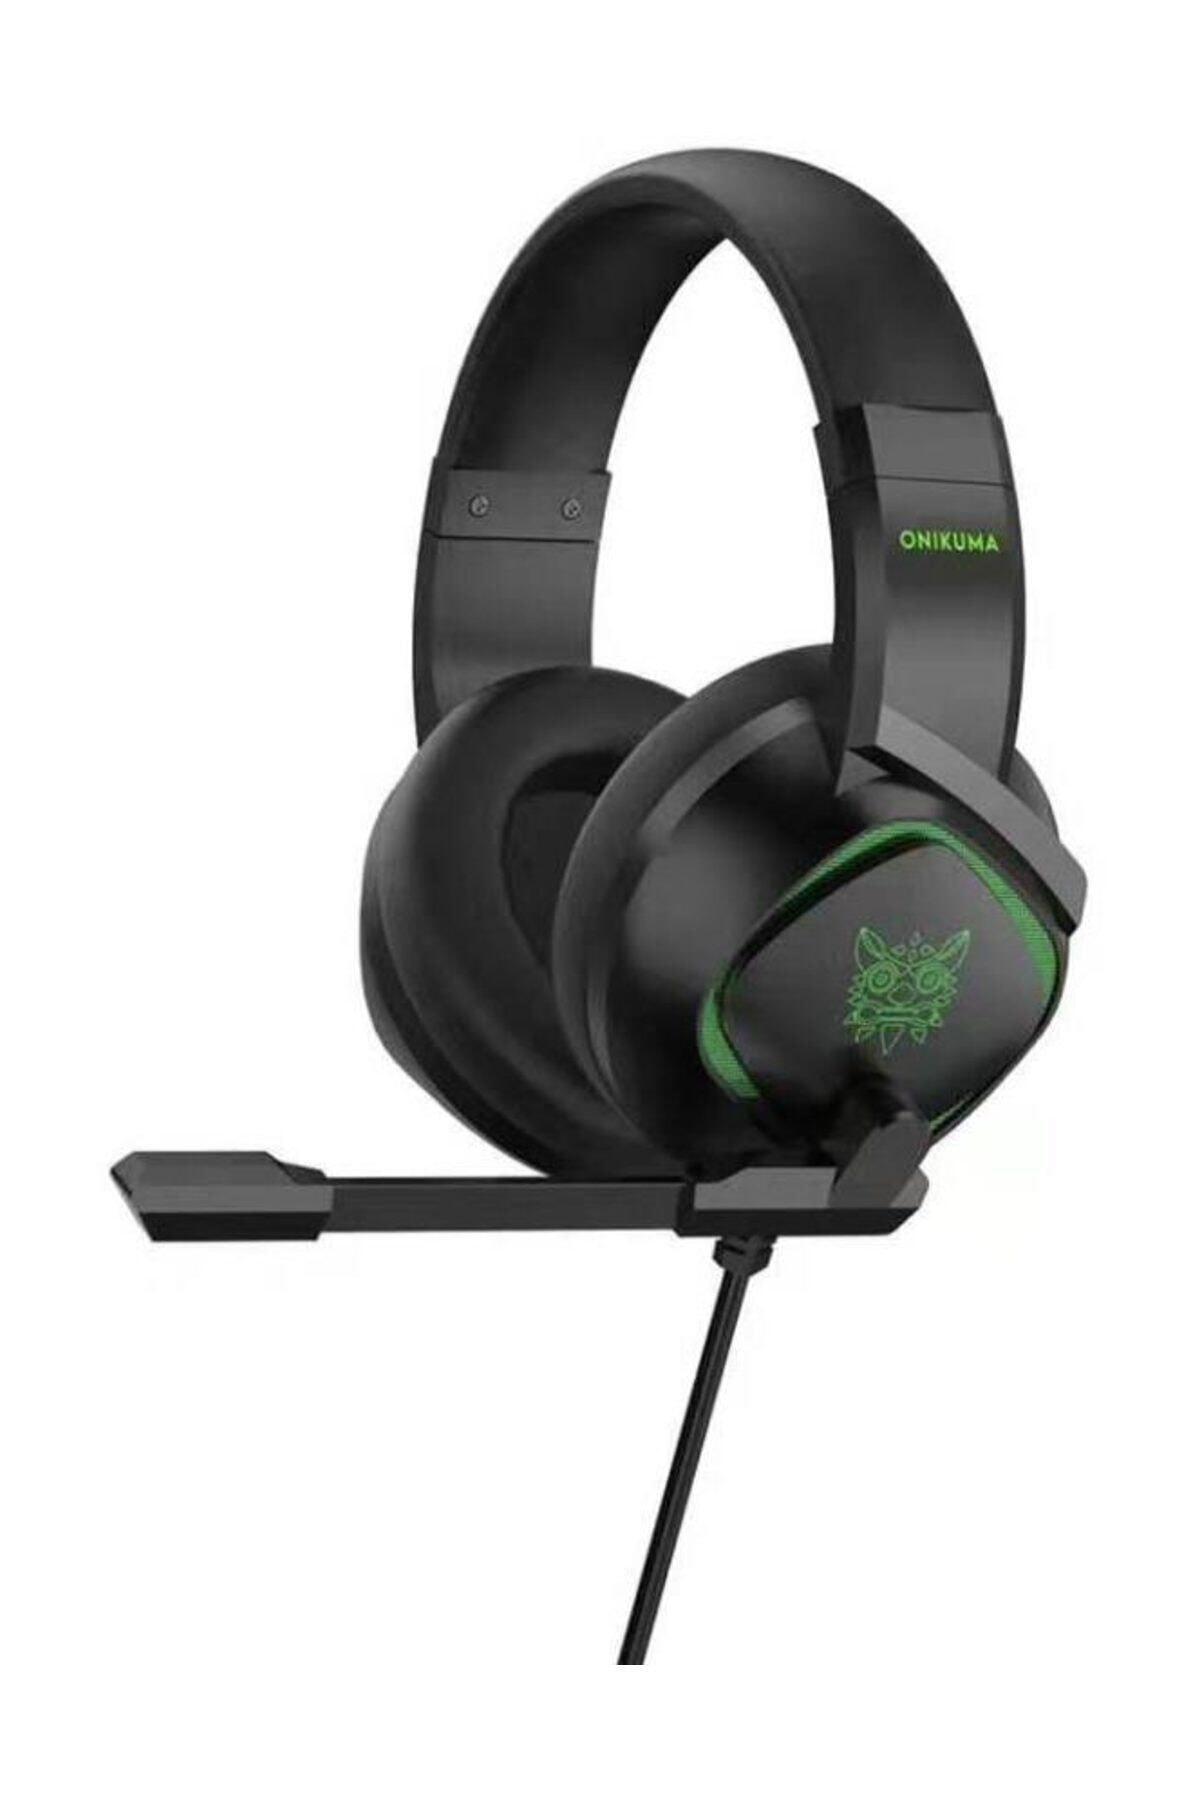 Profesyonel Oyuncu Kulaklığı Telefon Uyumlu Gaming Kulaklık Siyah Renkli Led Pc/ps4 Xbox Uyumlu